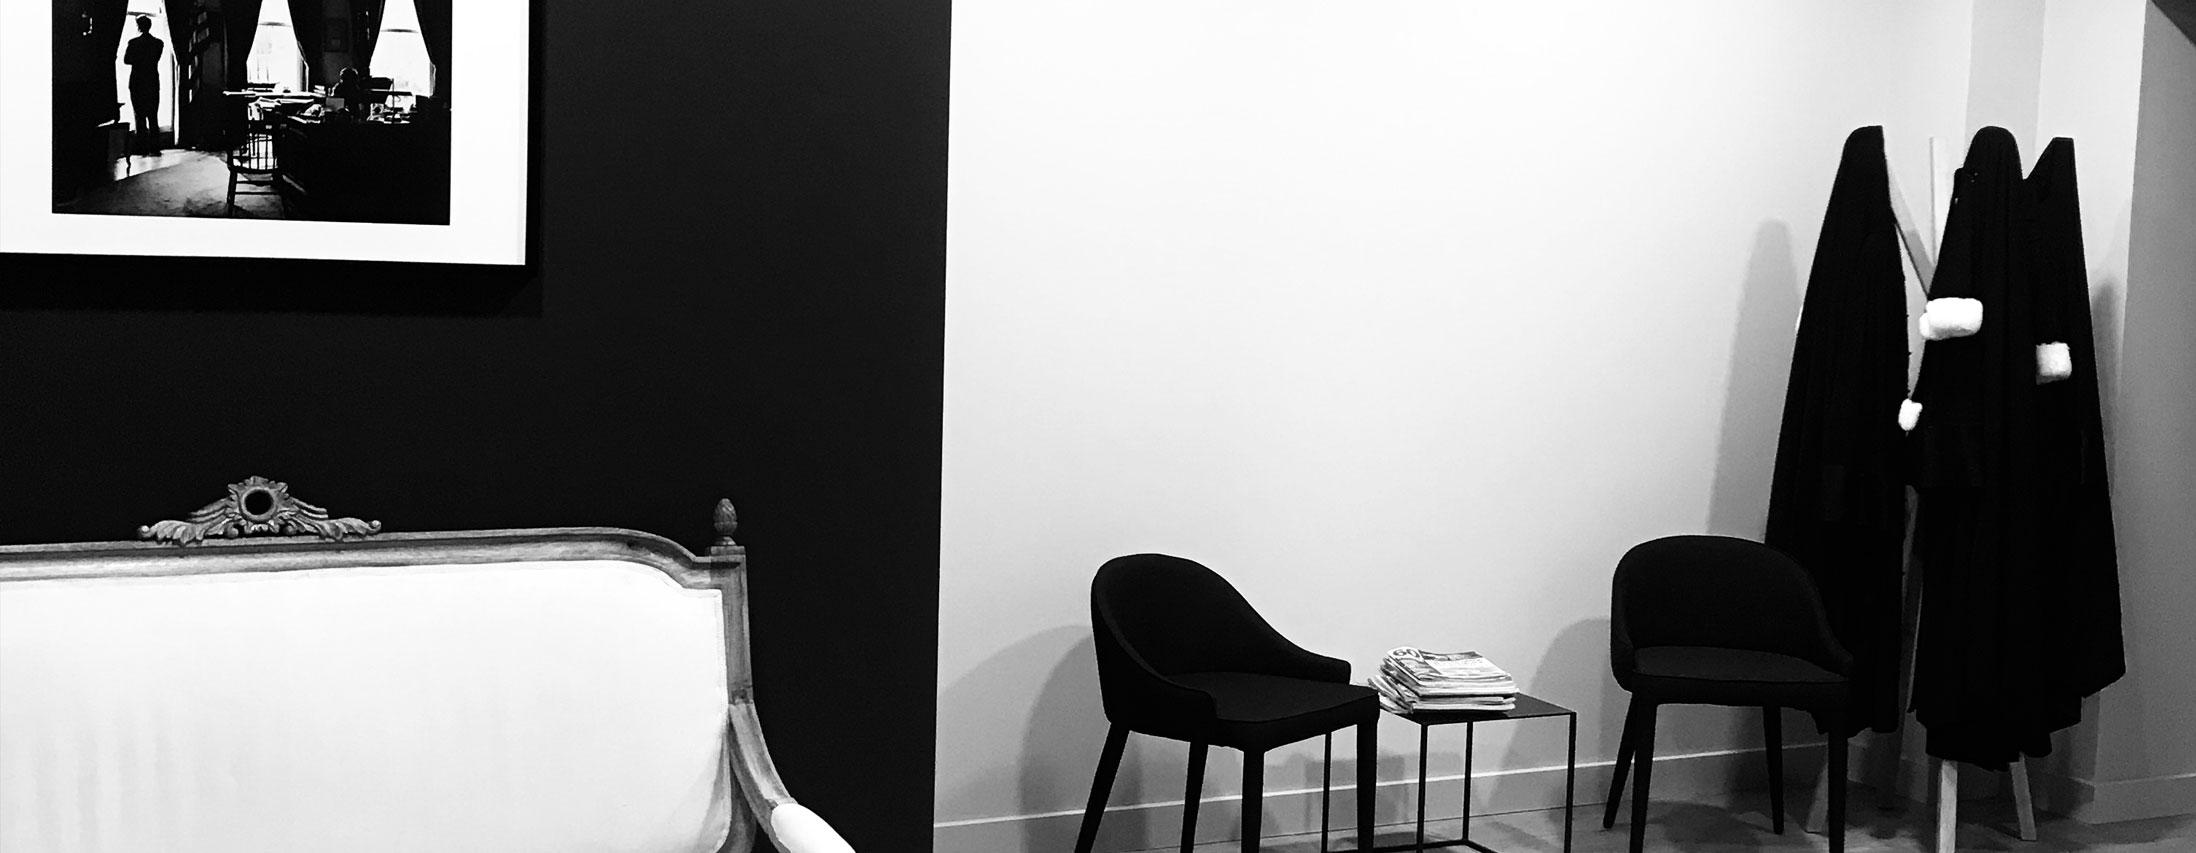 charles bernier cabinet bca avocats s te montpellier et b ziers. Black Bedroom Furniture Sets. Home Design Ideas